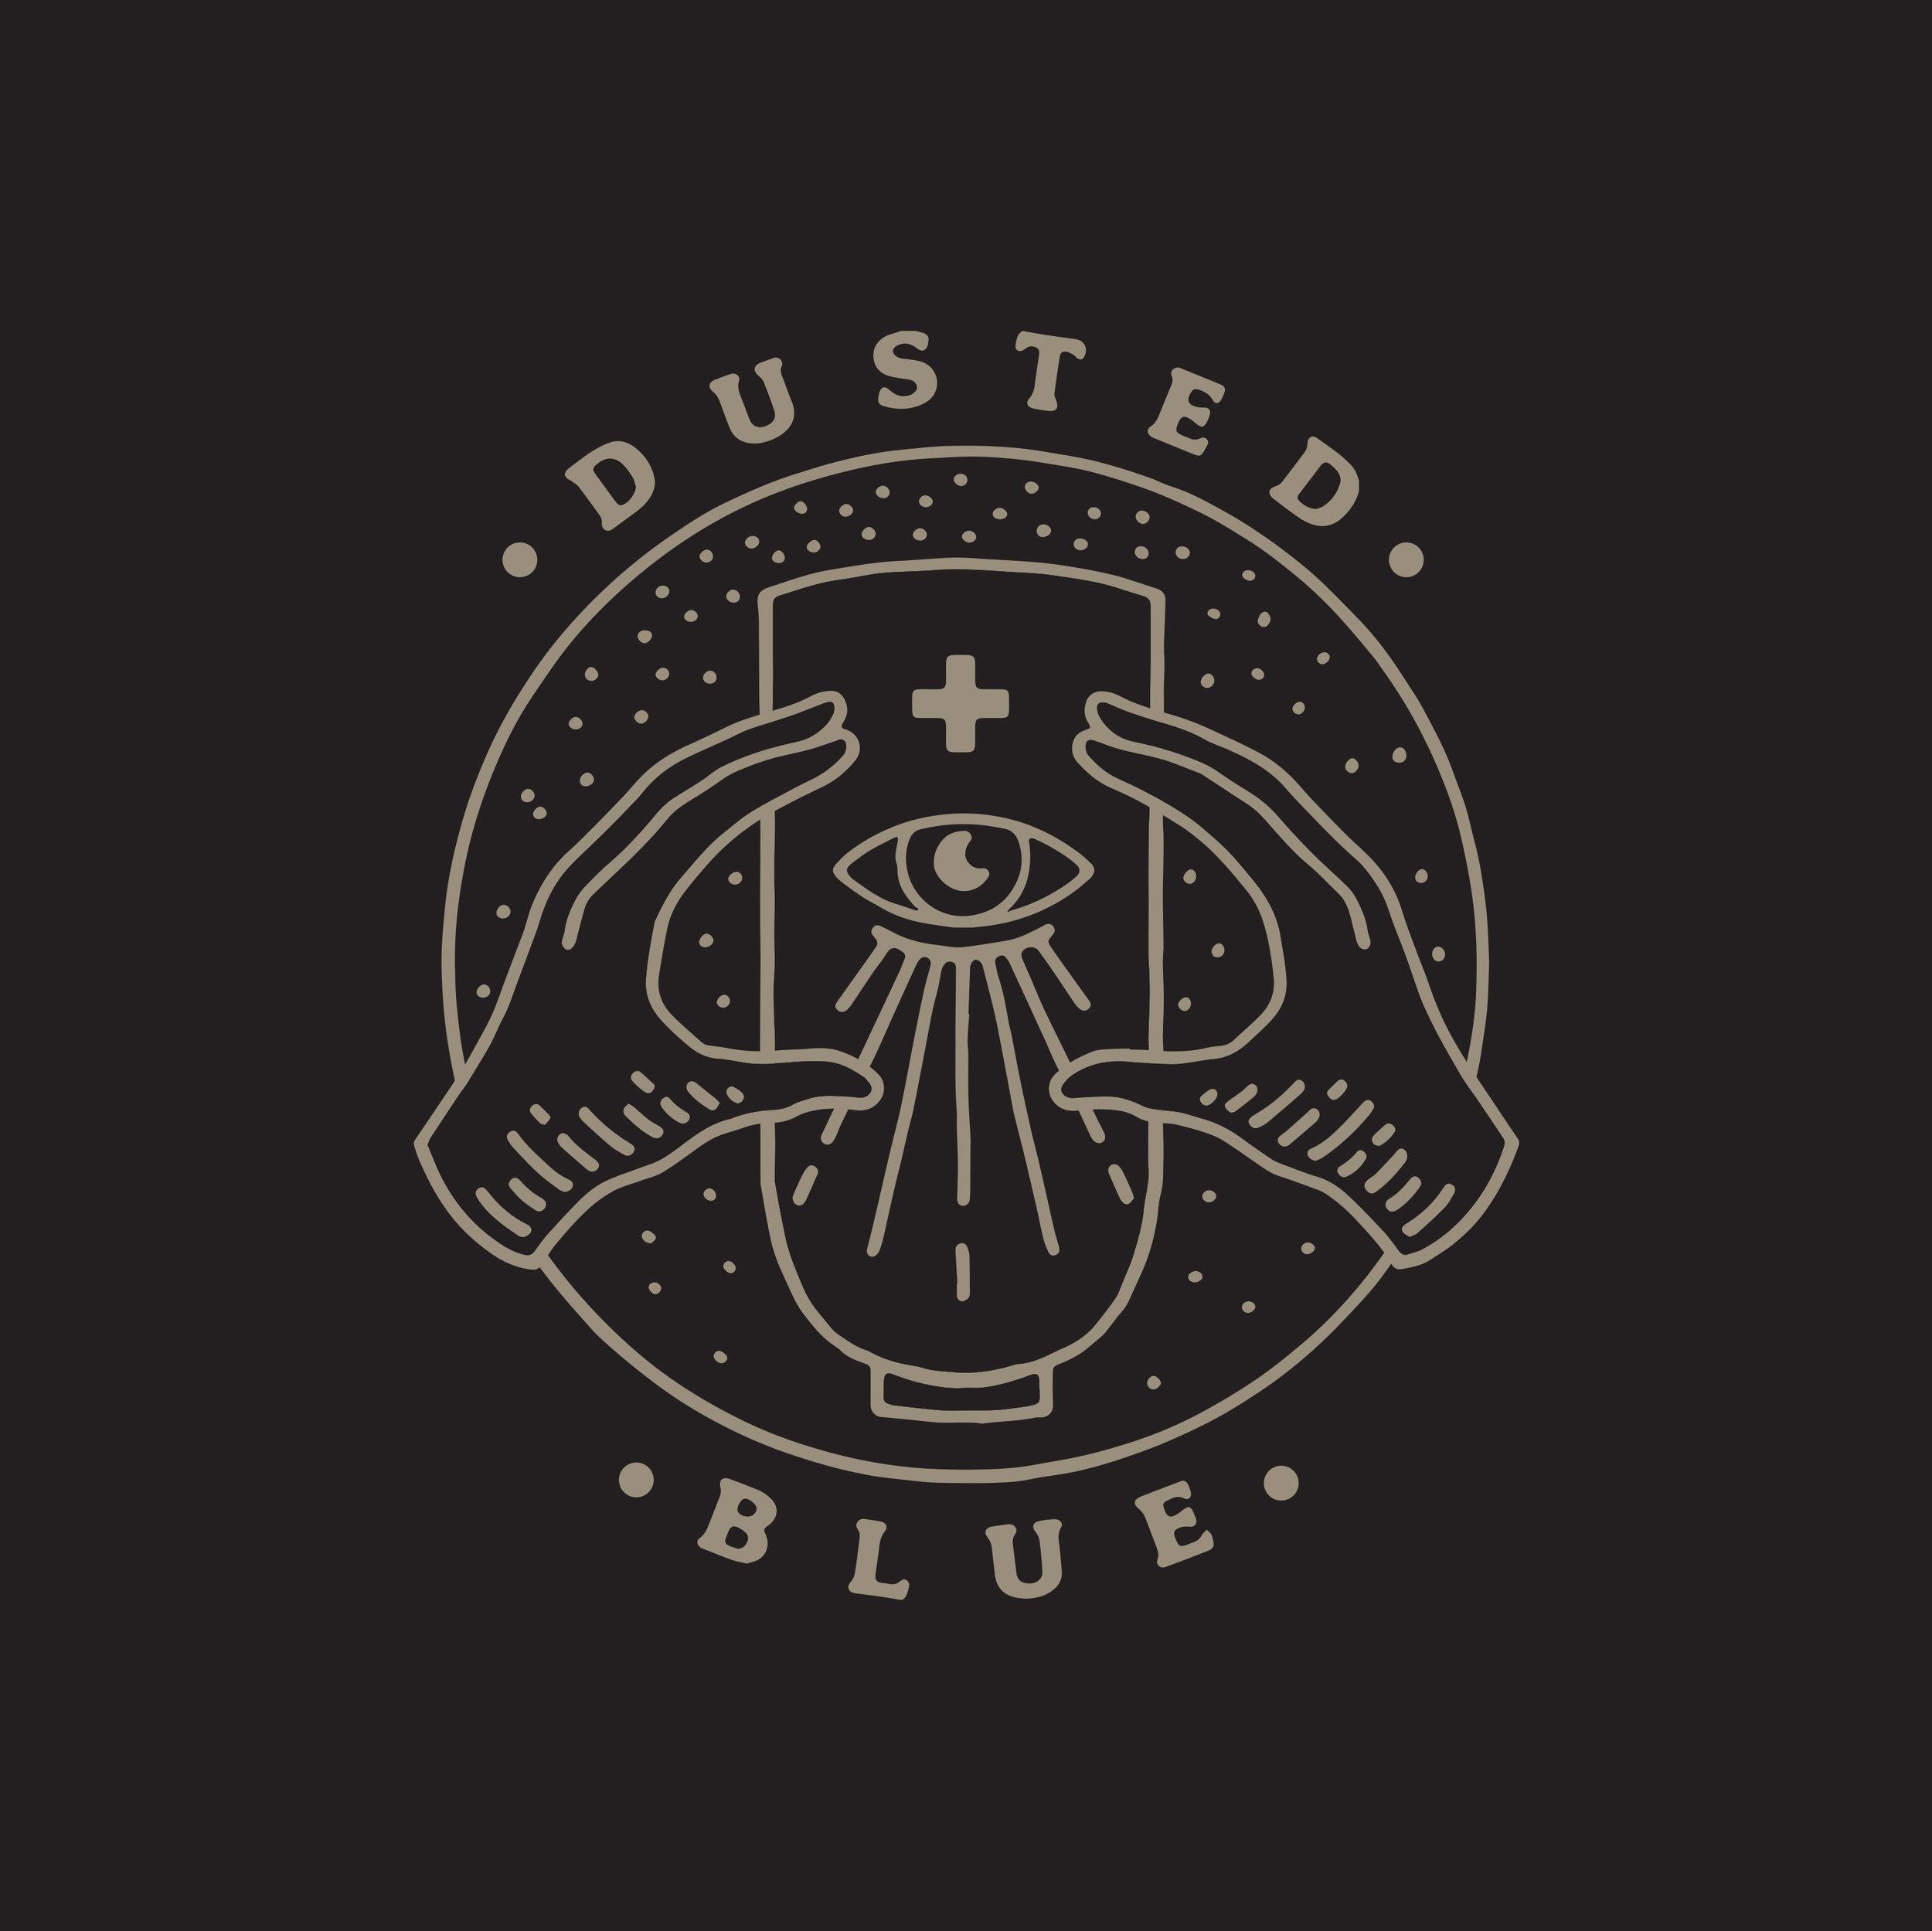 Dusted+Blue Logo Final -1.jpg